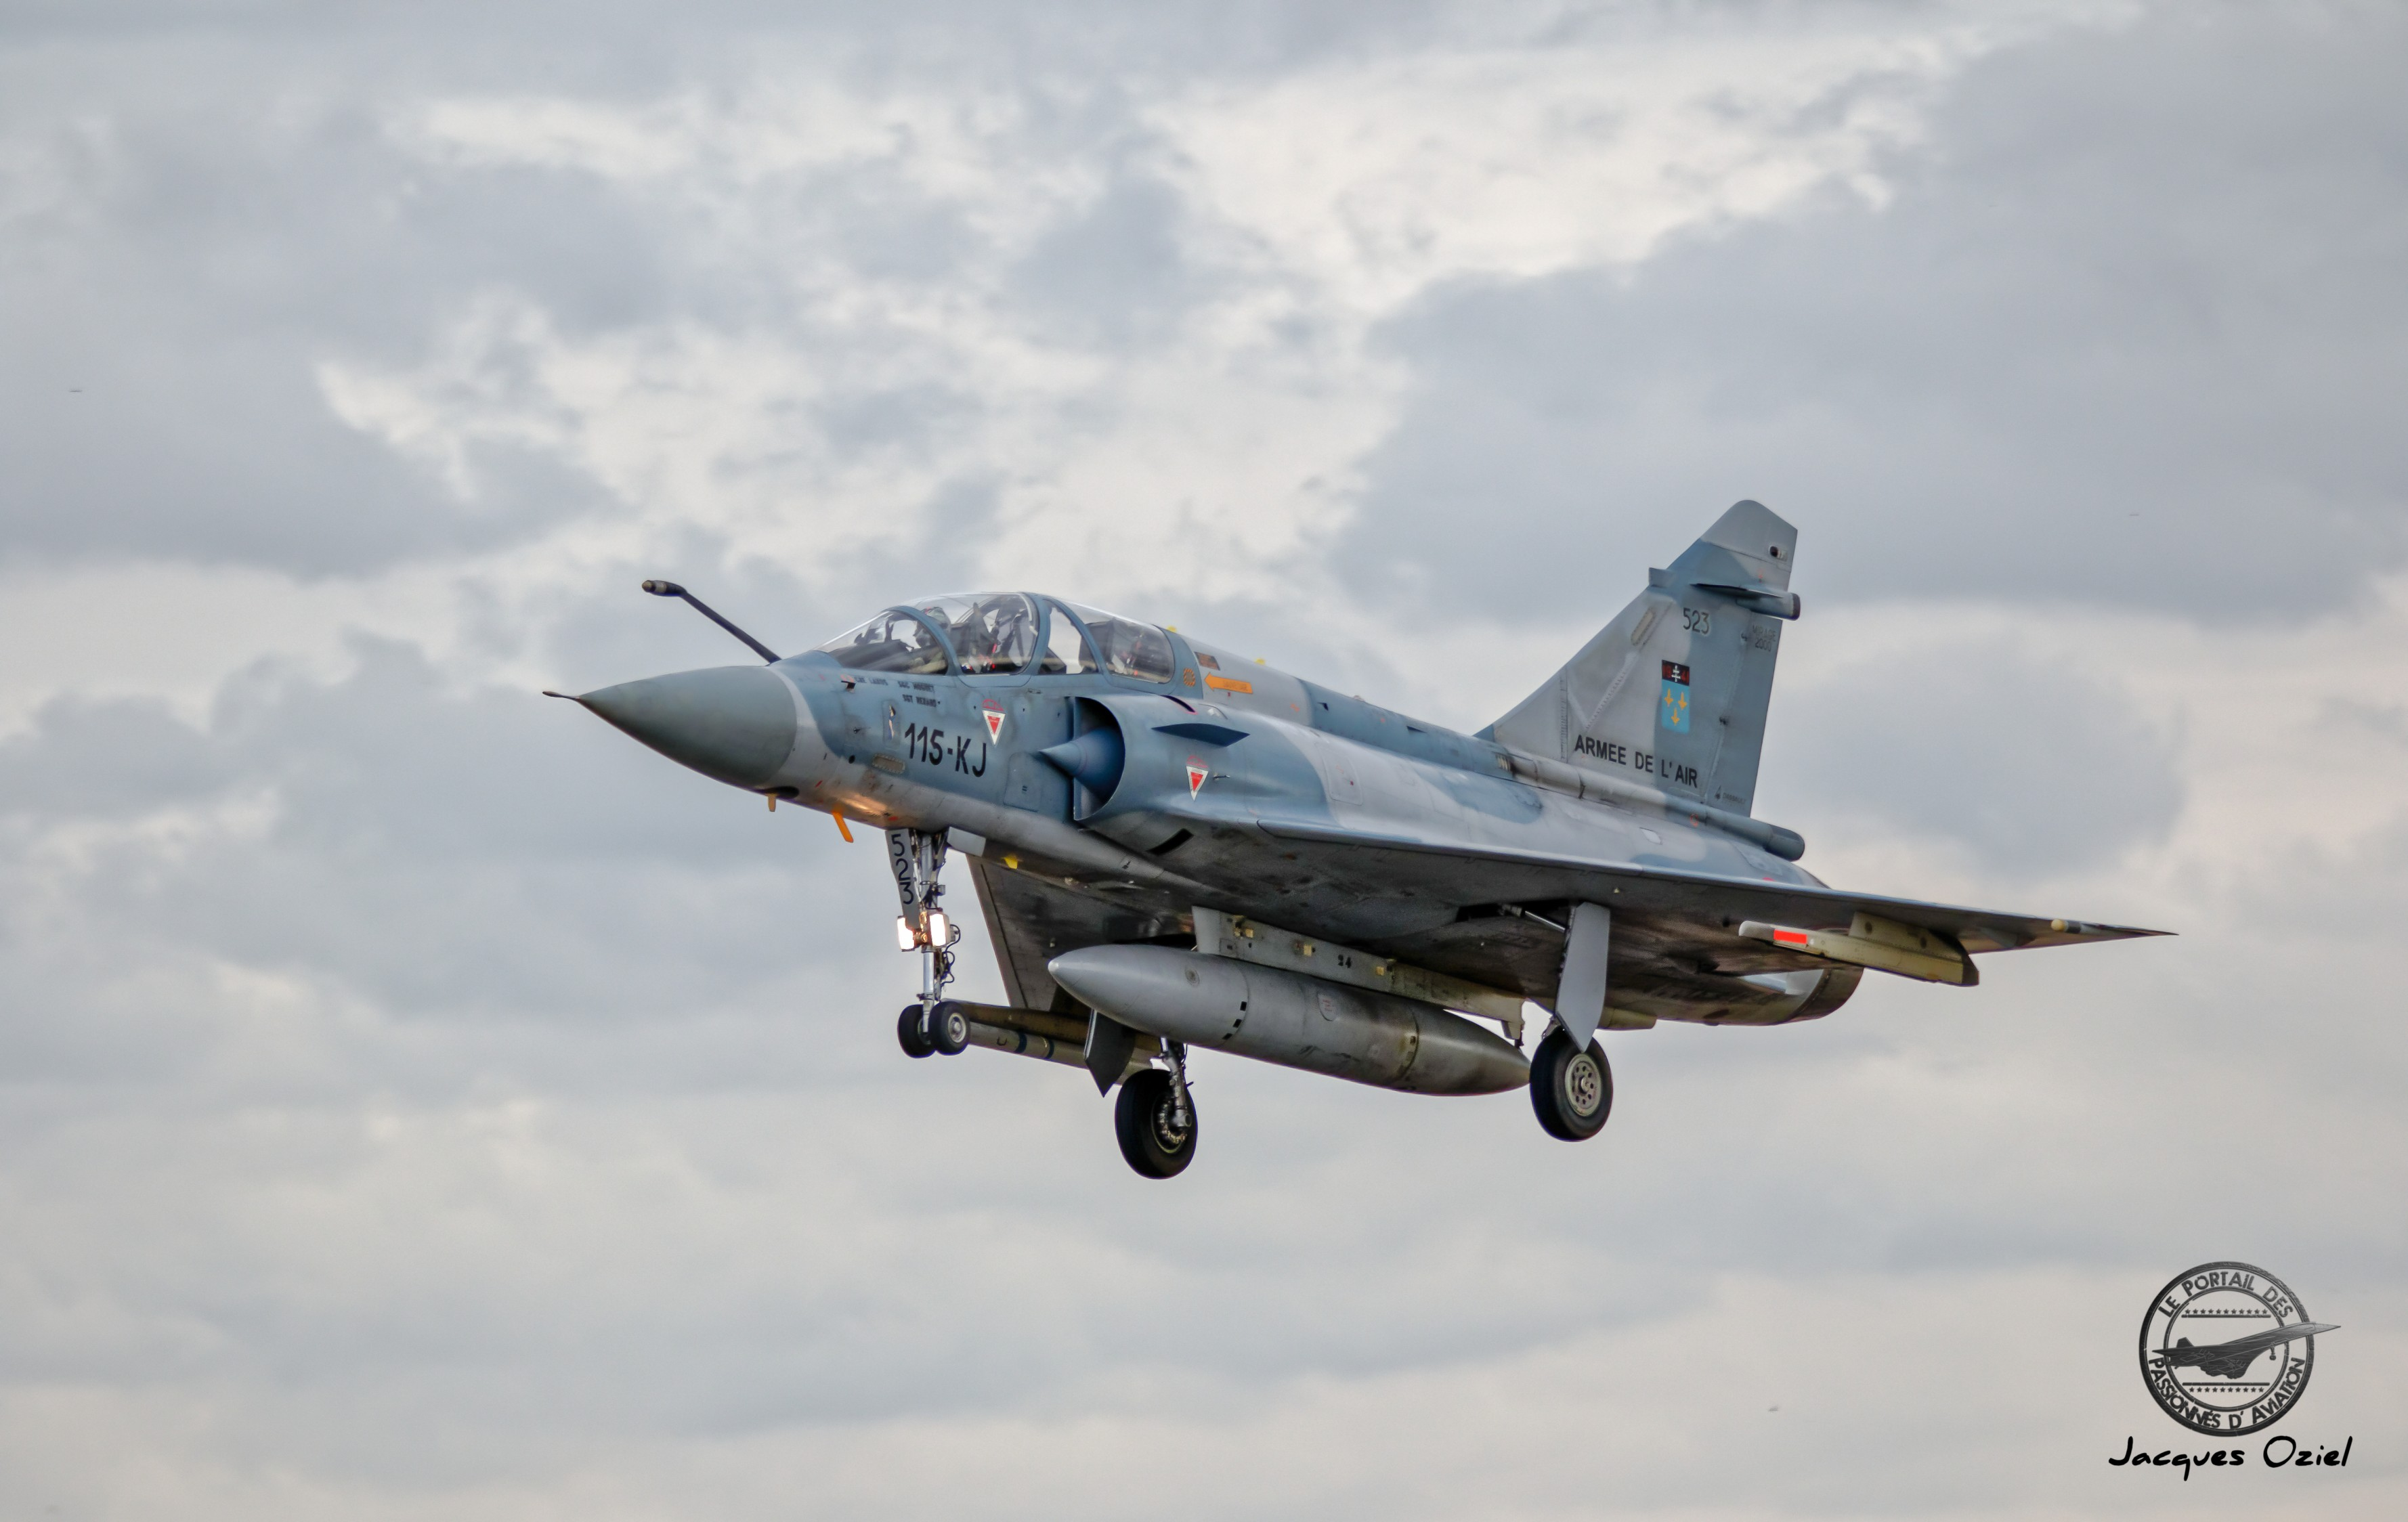 Dassault-Breguet Mirage 2000 B - 523/115-KJ - France/EC 2/5 Ile de France